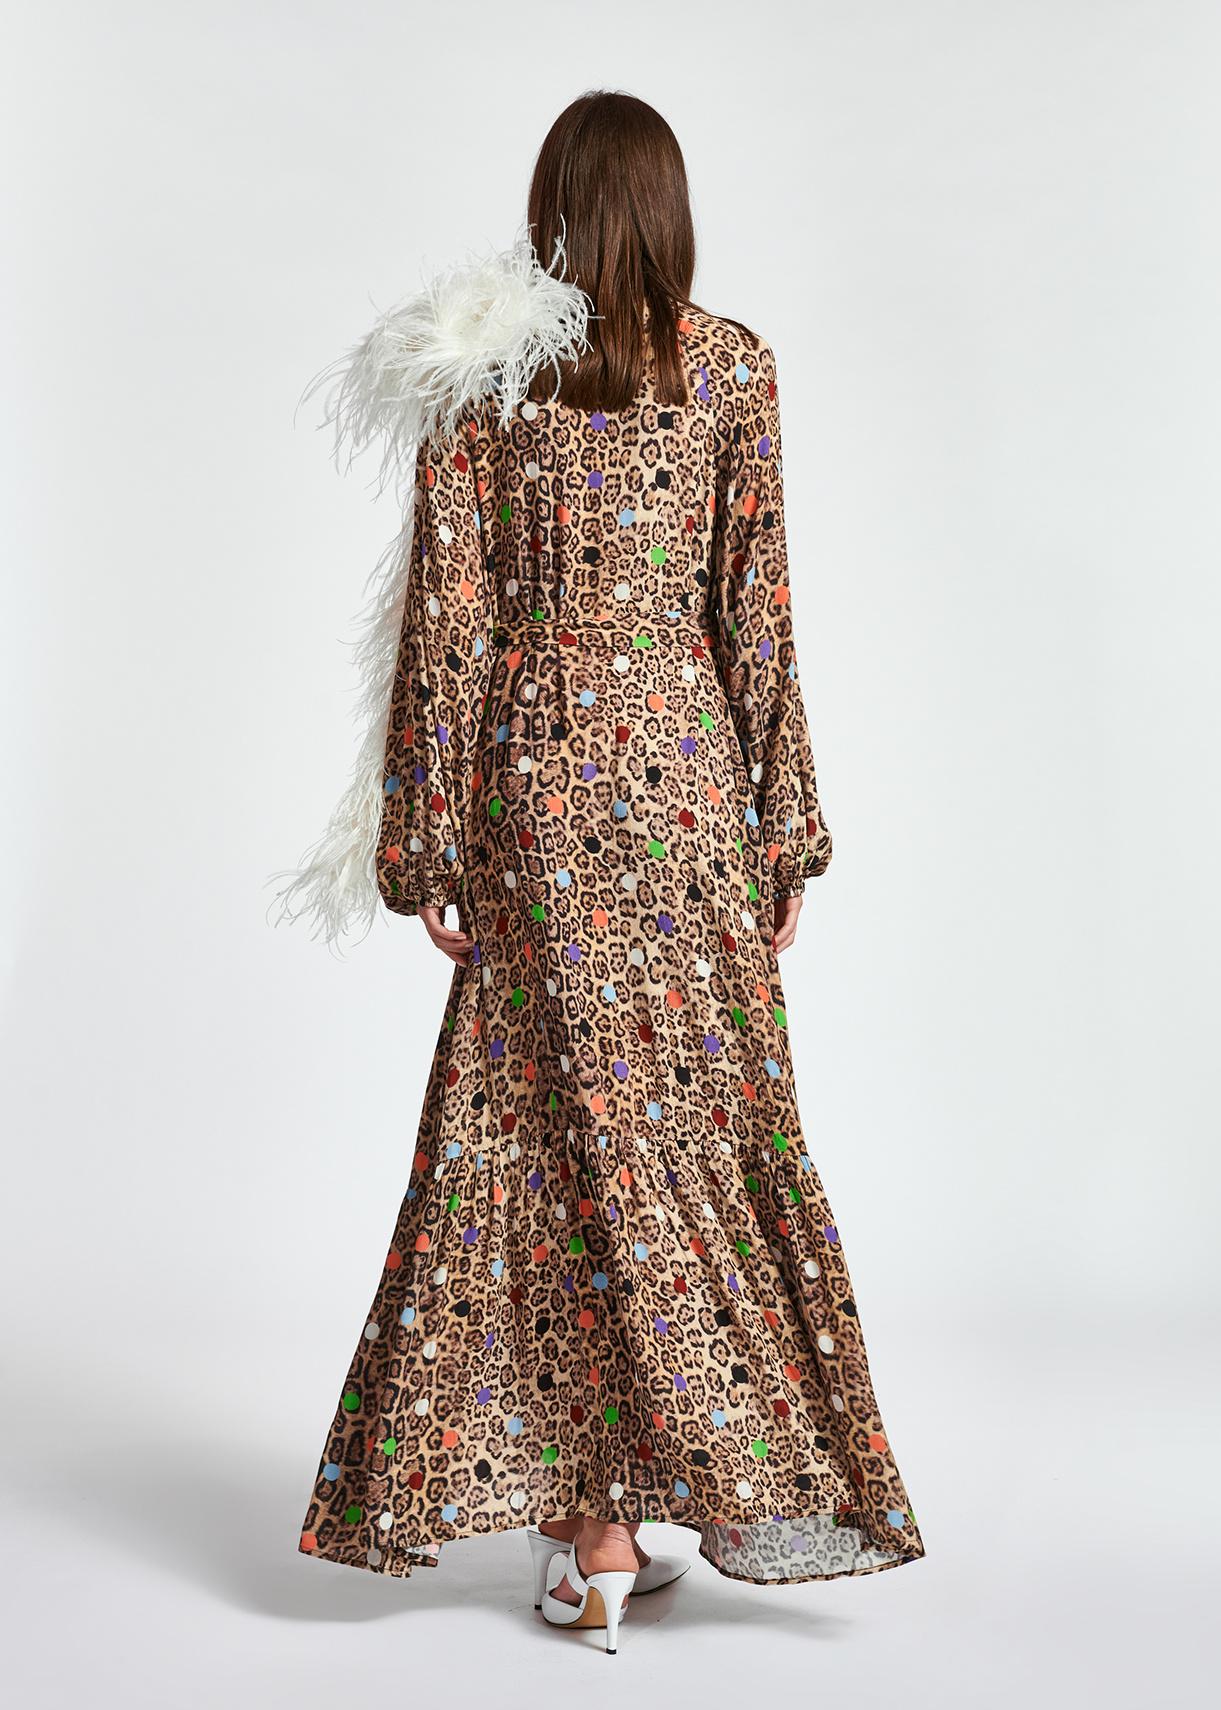 ZEBEL robe-7